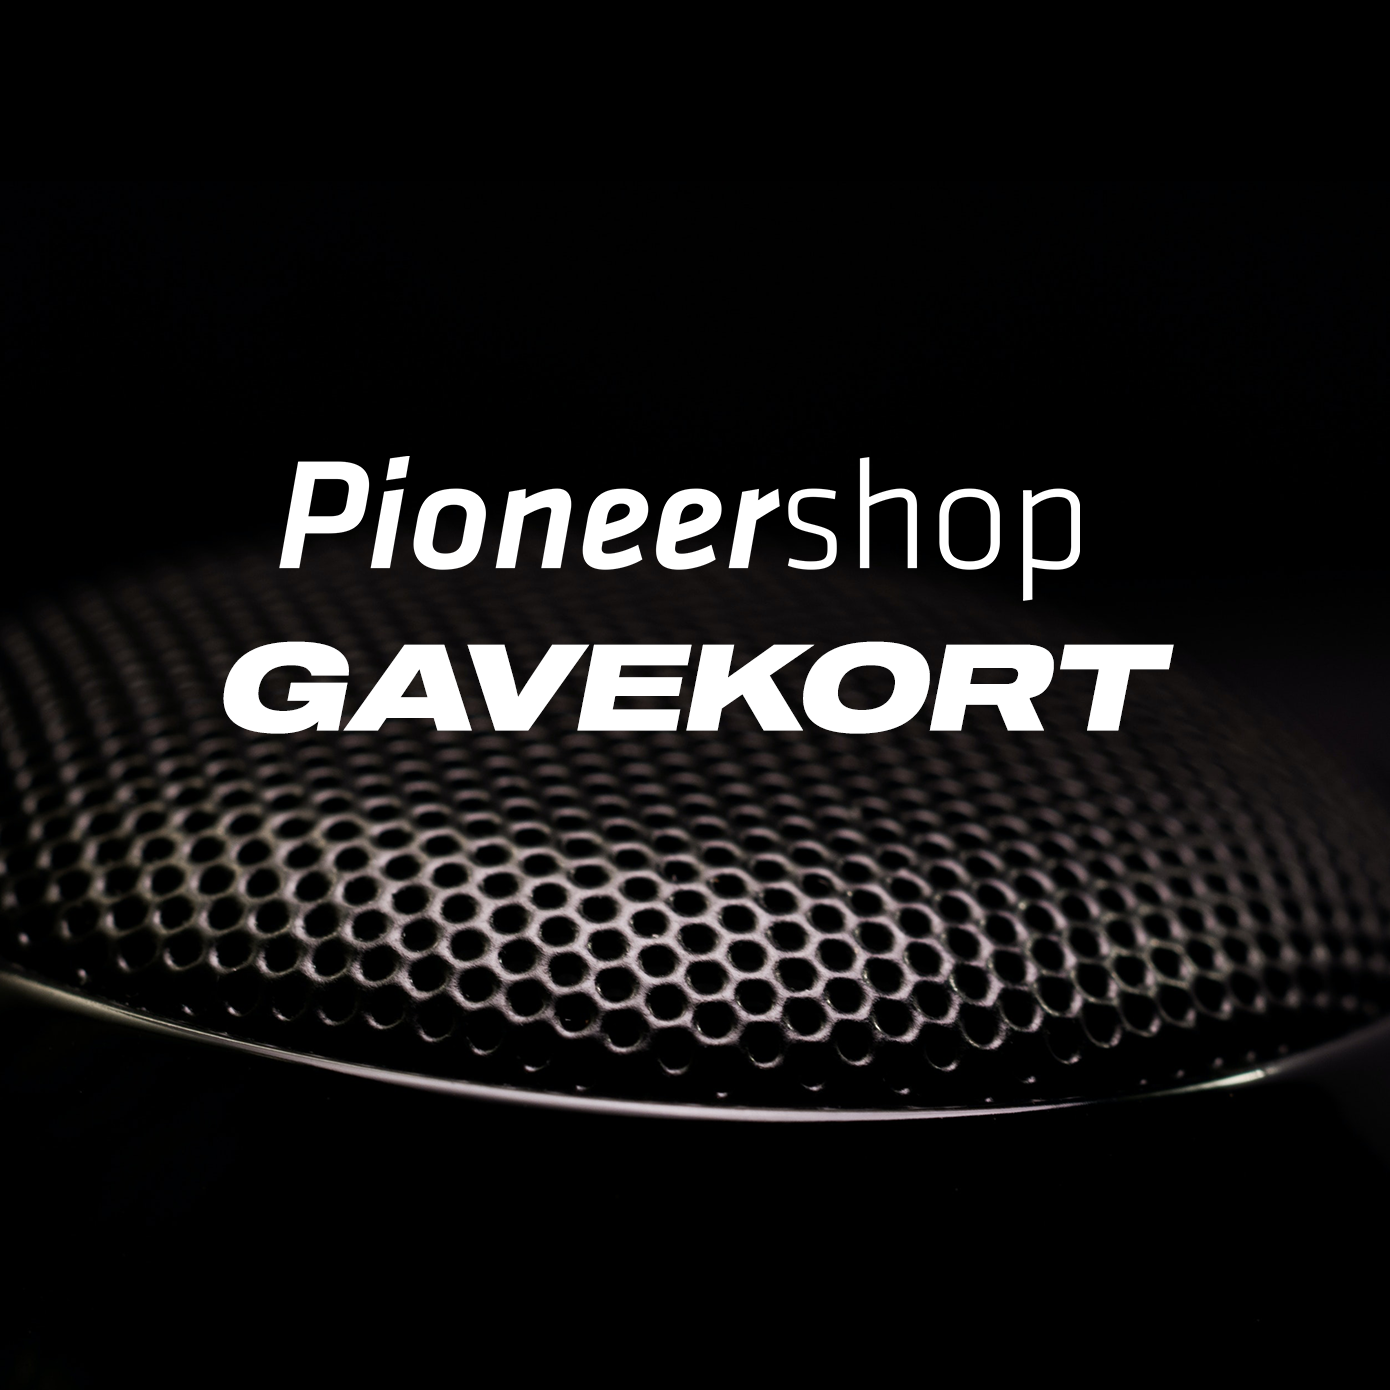 PionerShop.dk Gavekort (e-mail)